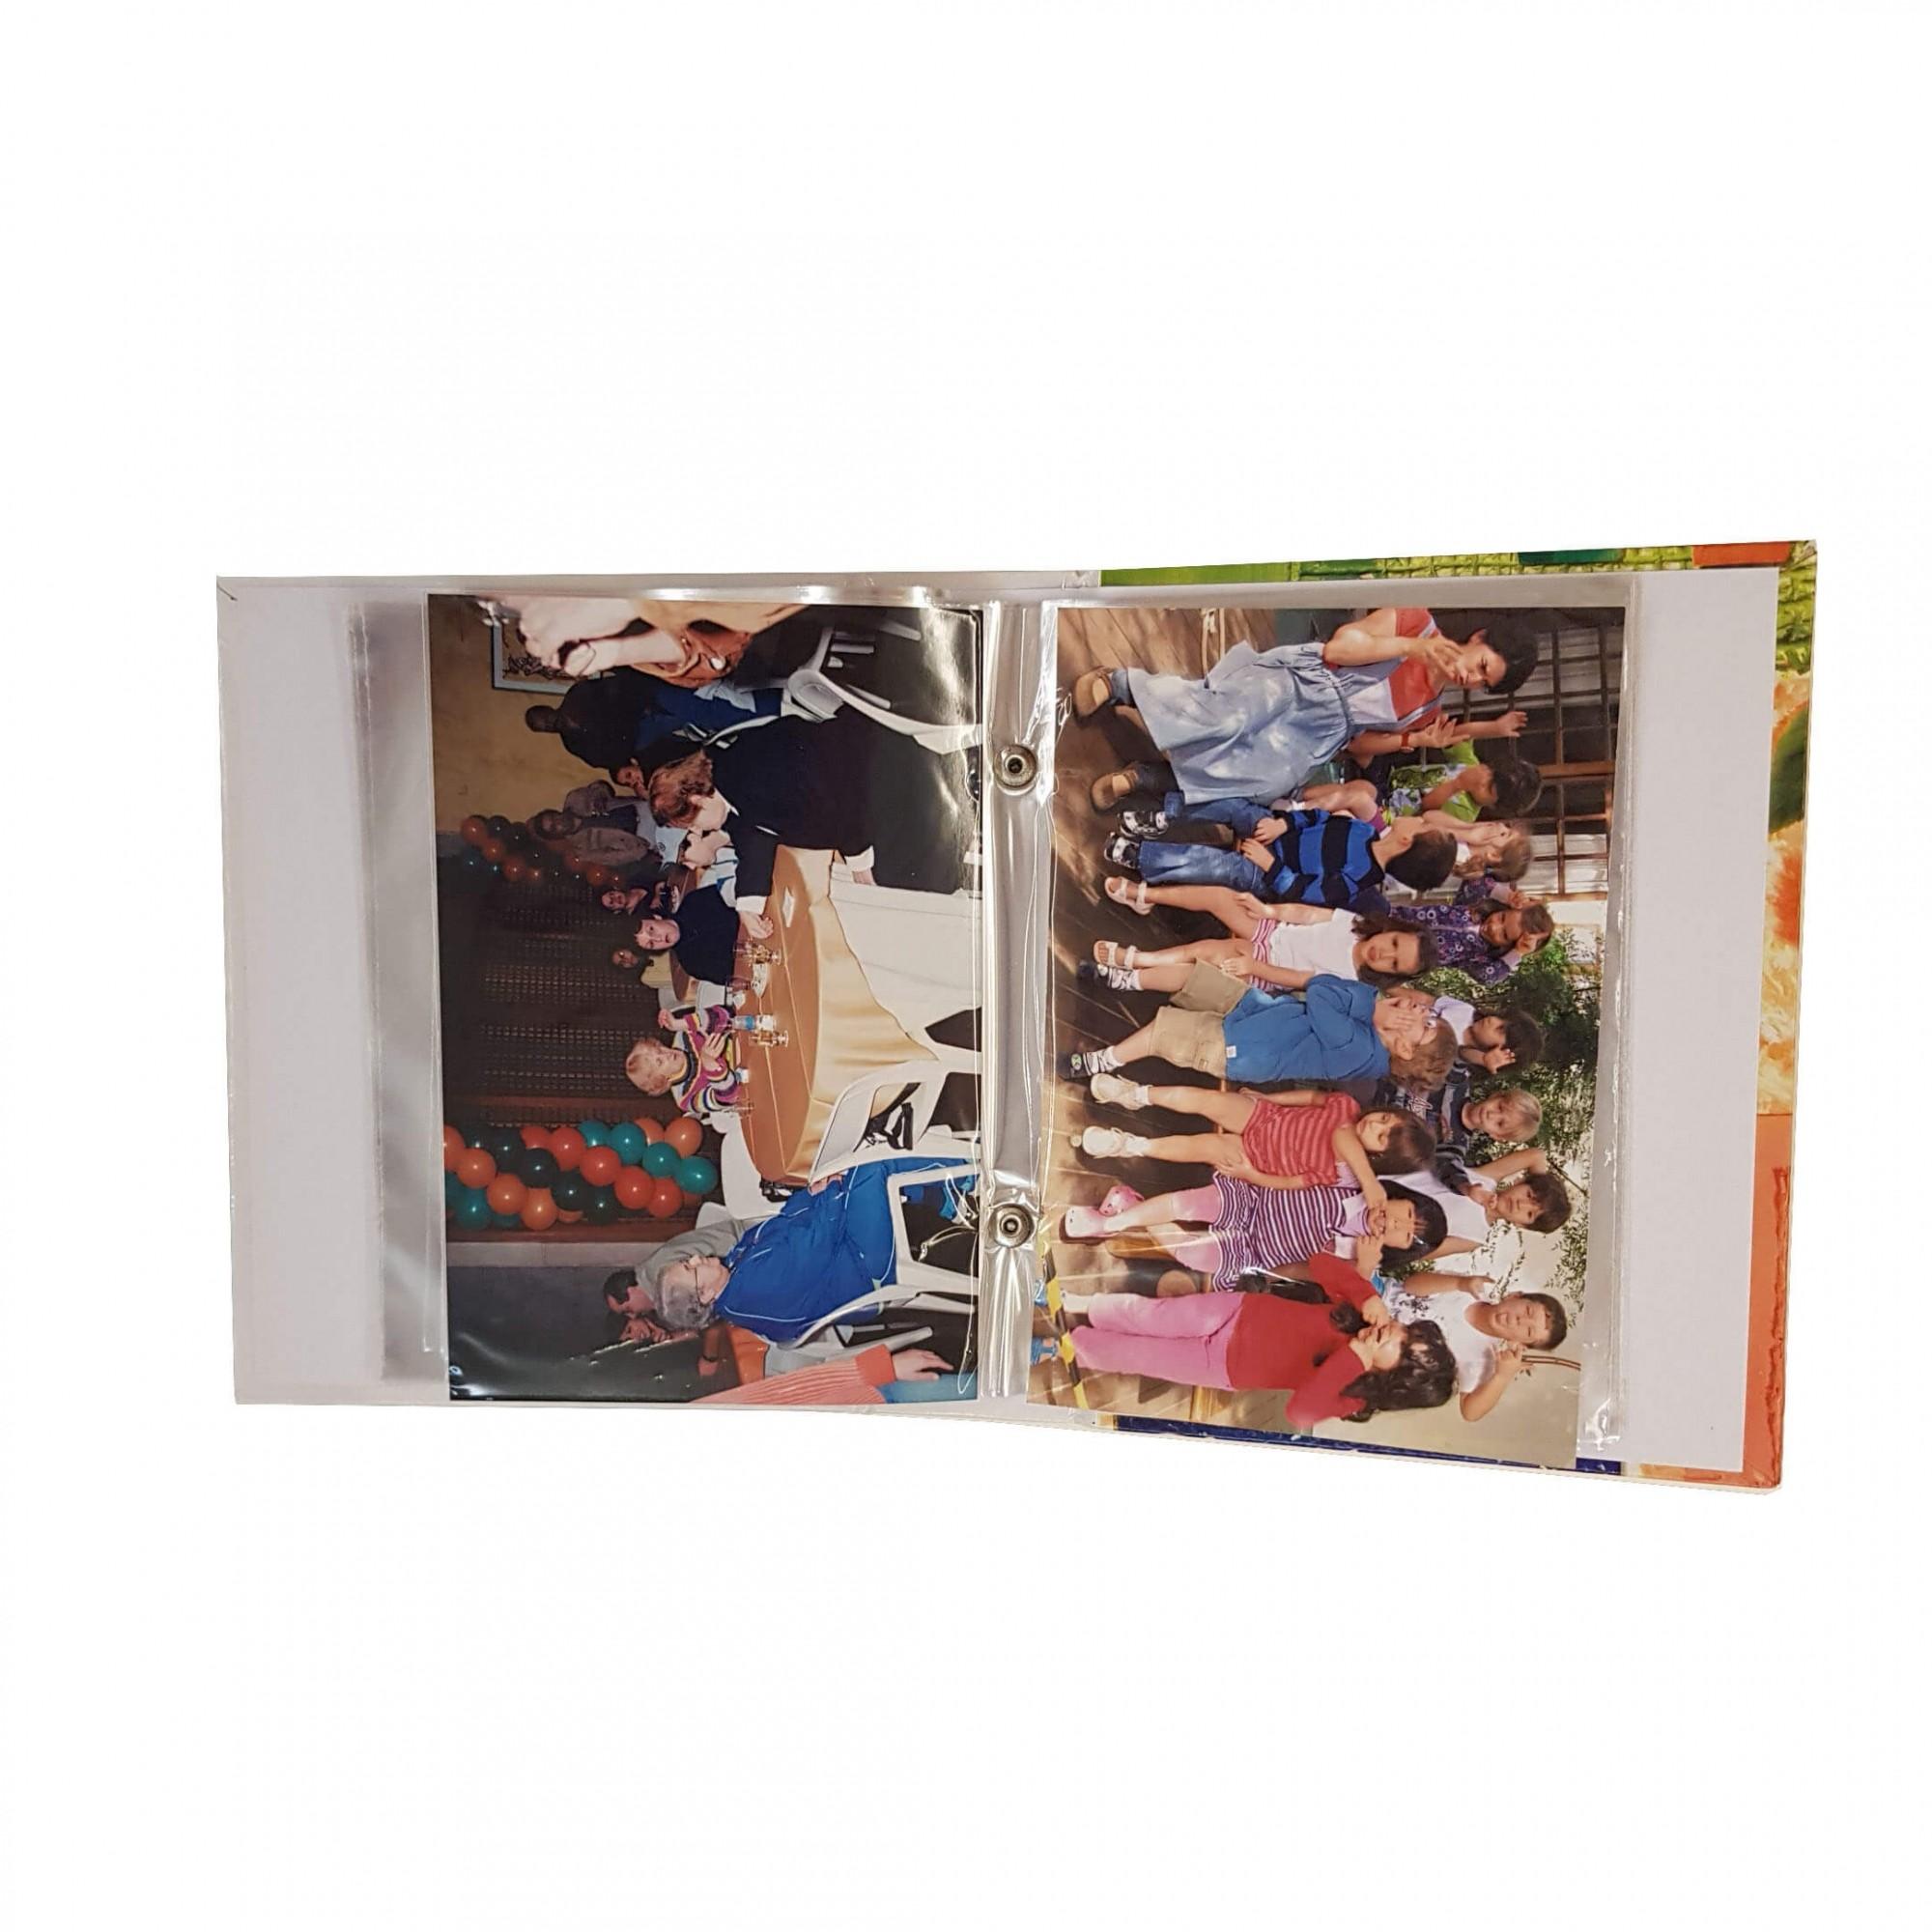 1 Álbum de fotos Fotografias  10 X15 120 Fotos iNFANTIL